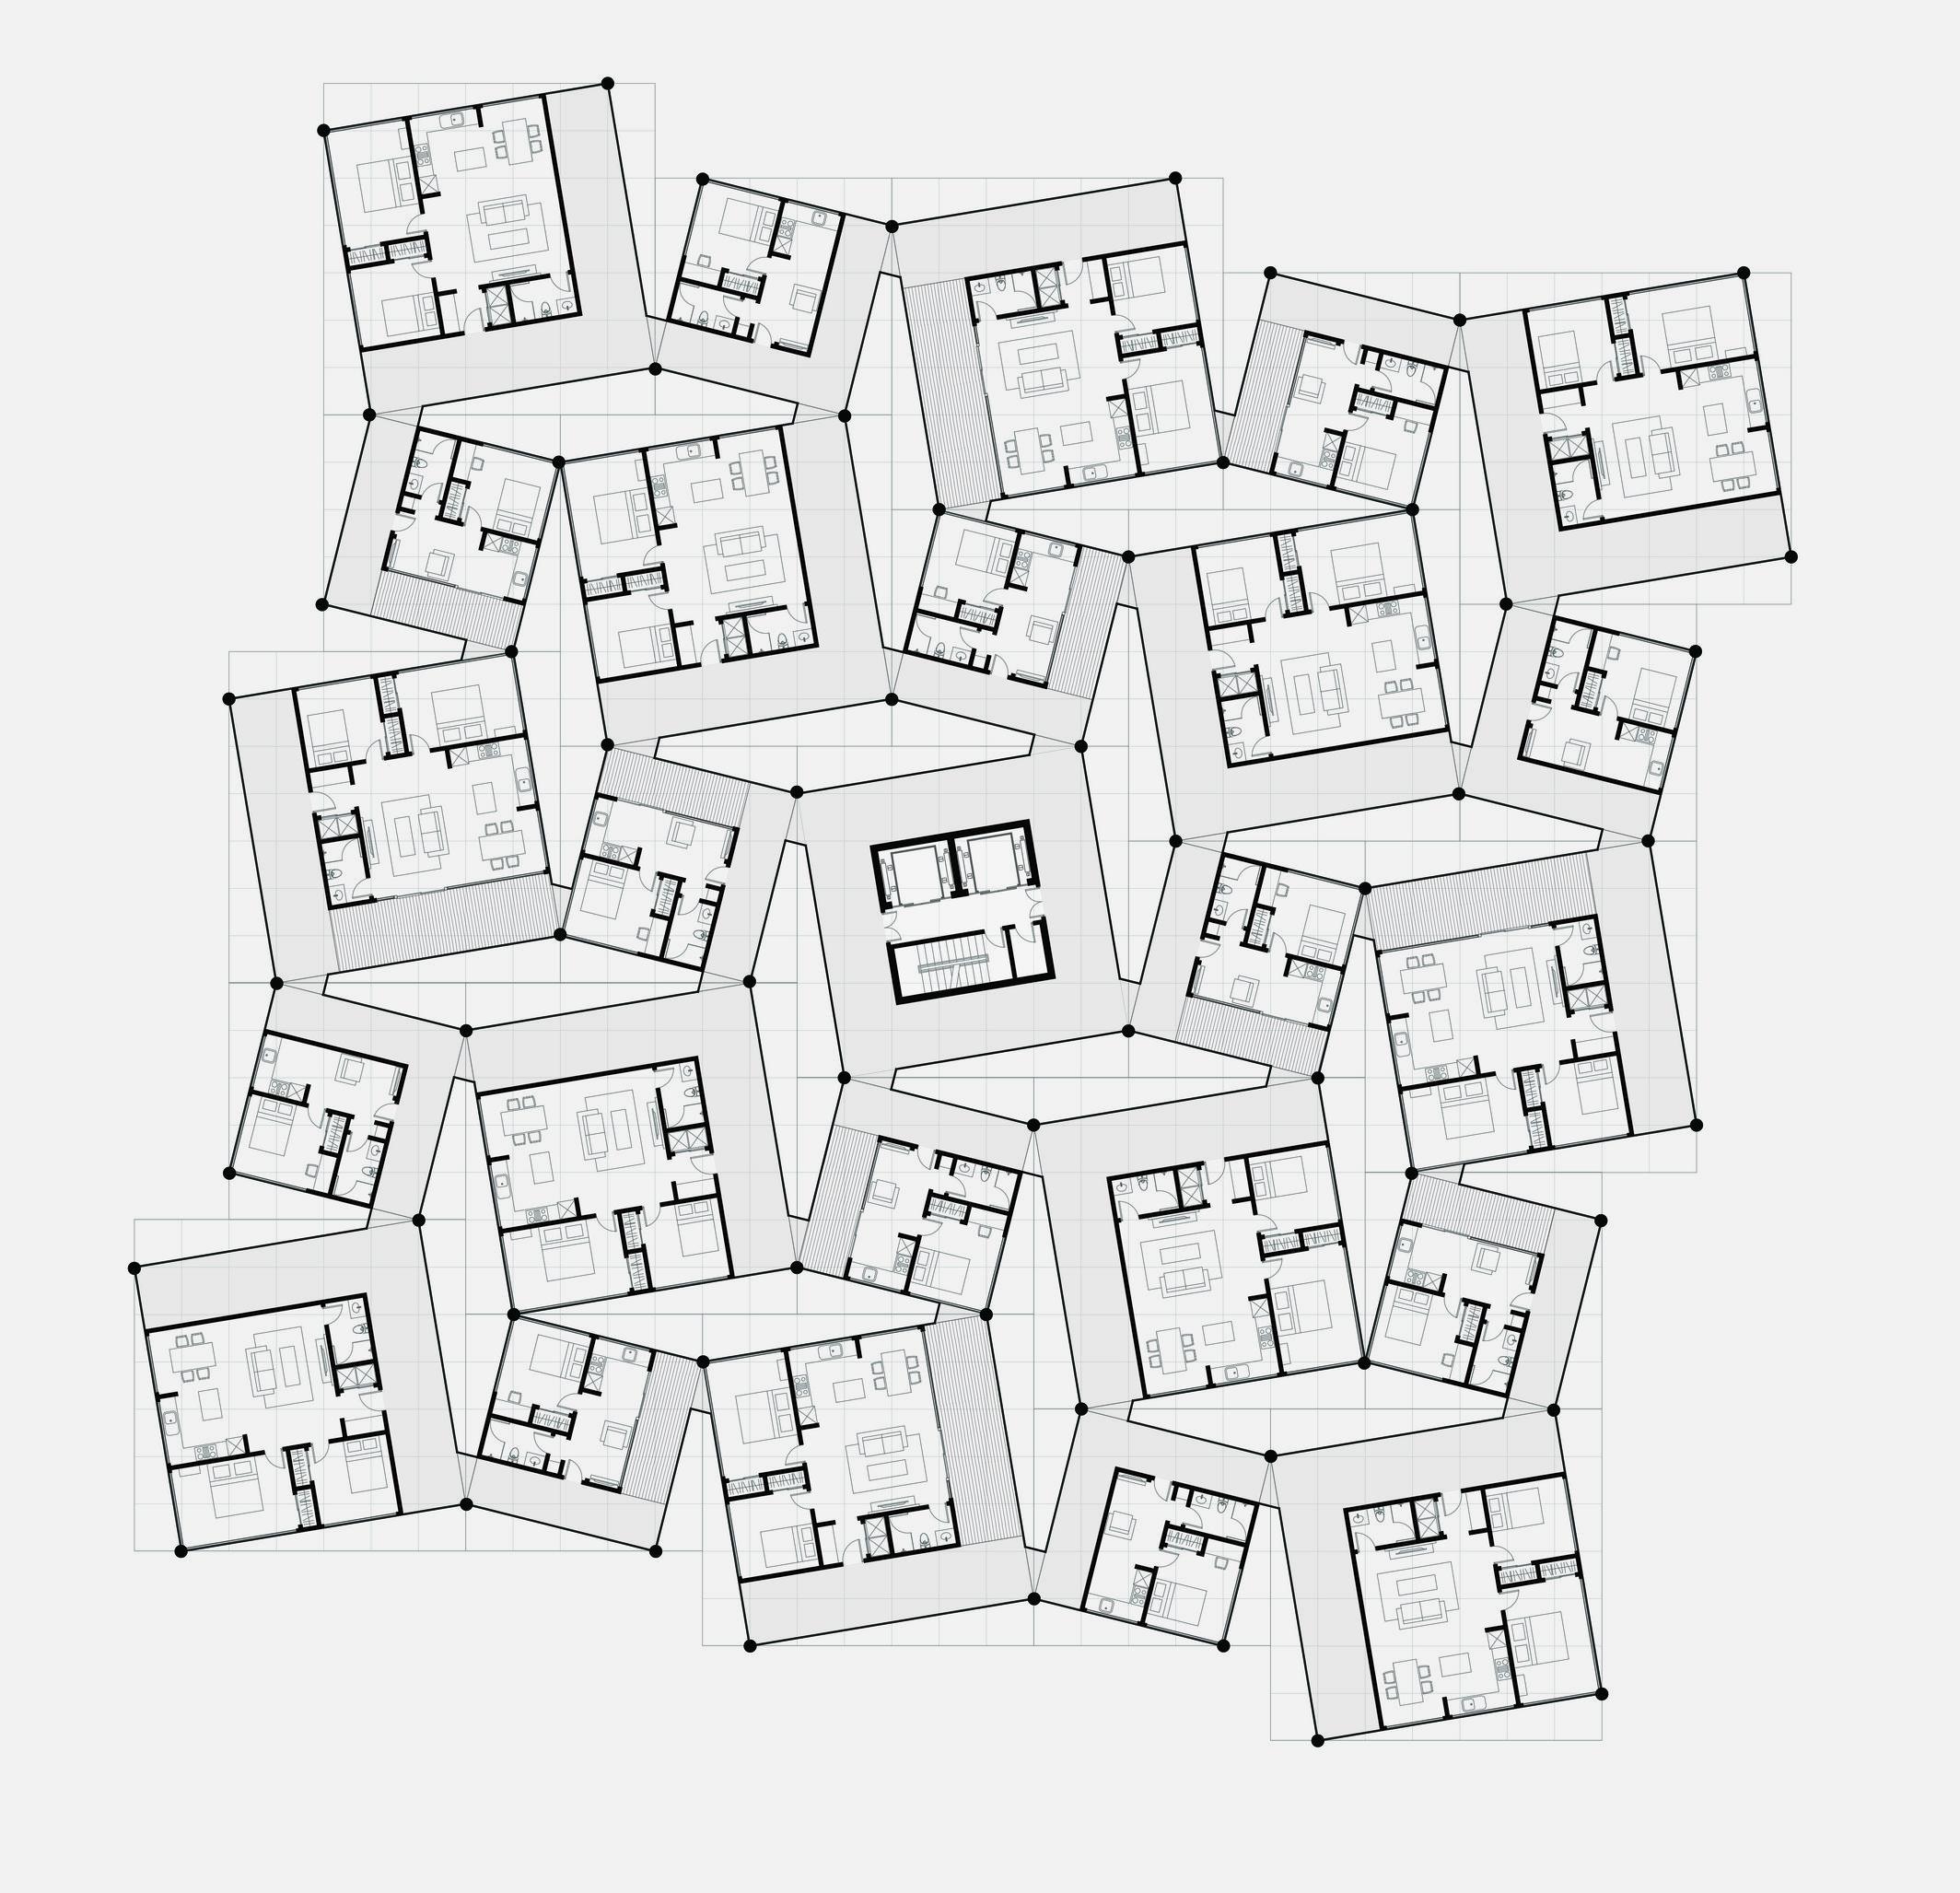 Proto-floor plan